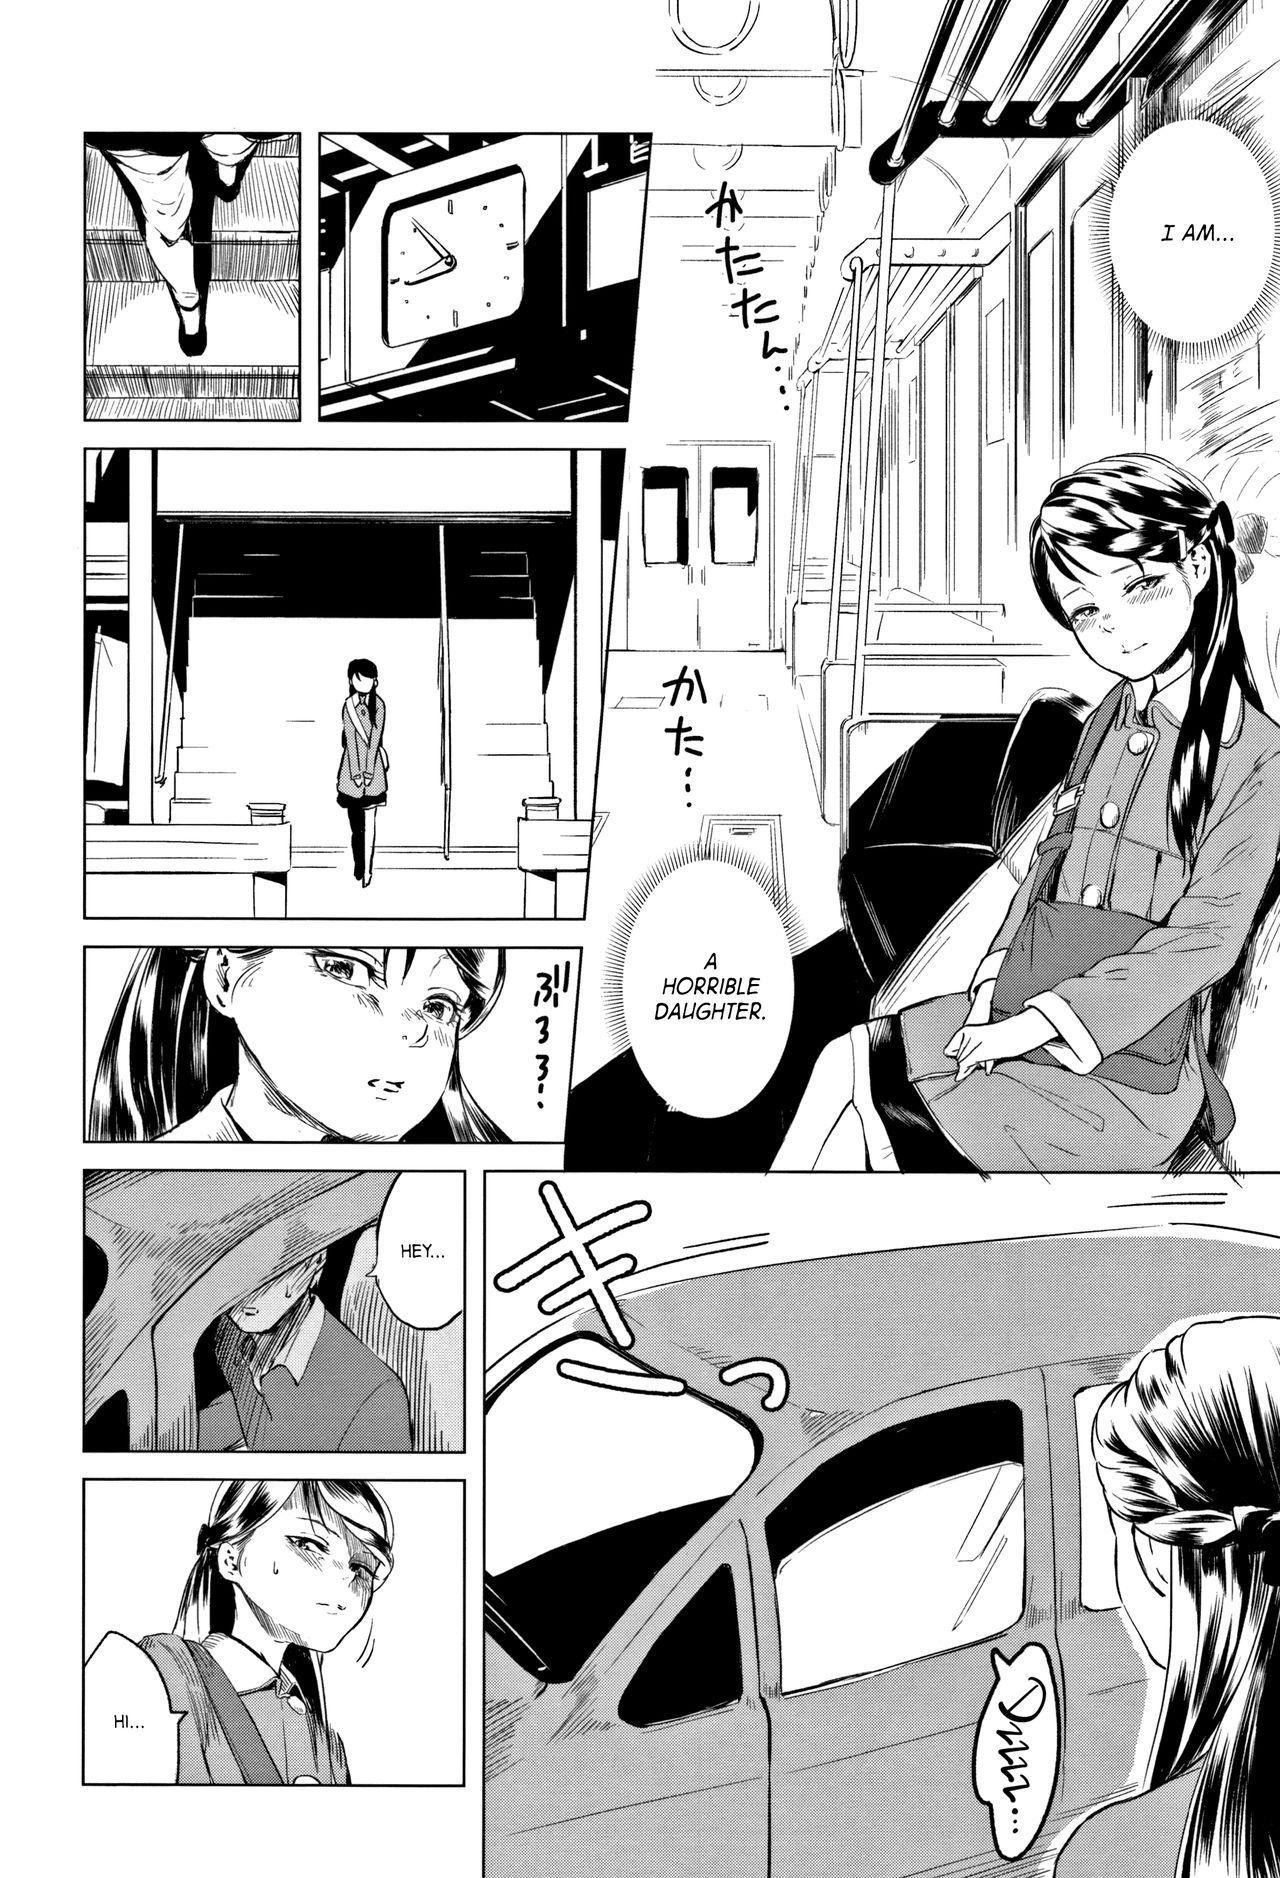 Chichi to Musume no Seiai Hakusho | Father and daughter sex white paper 191